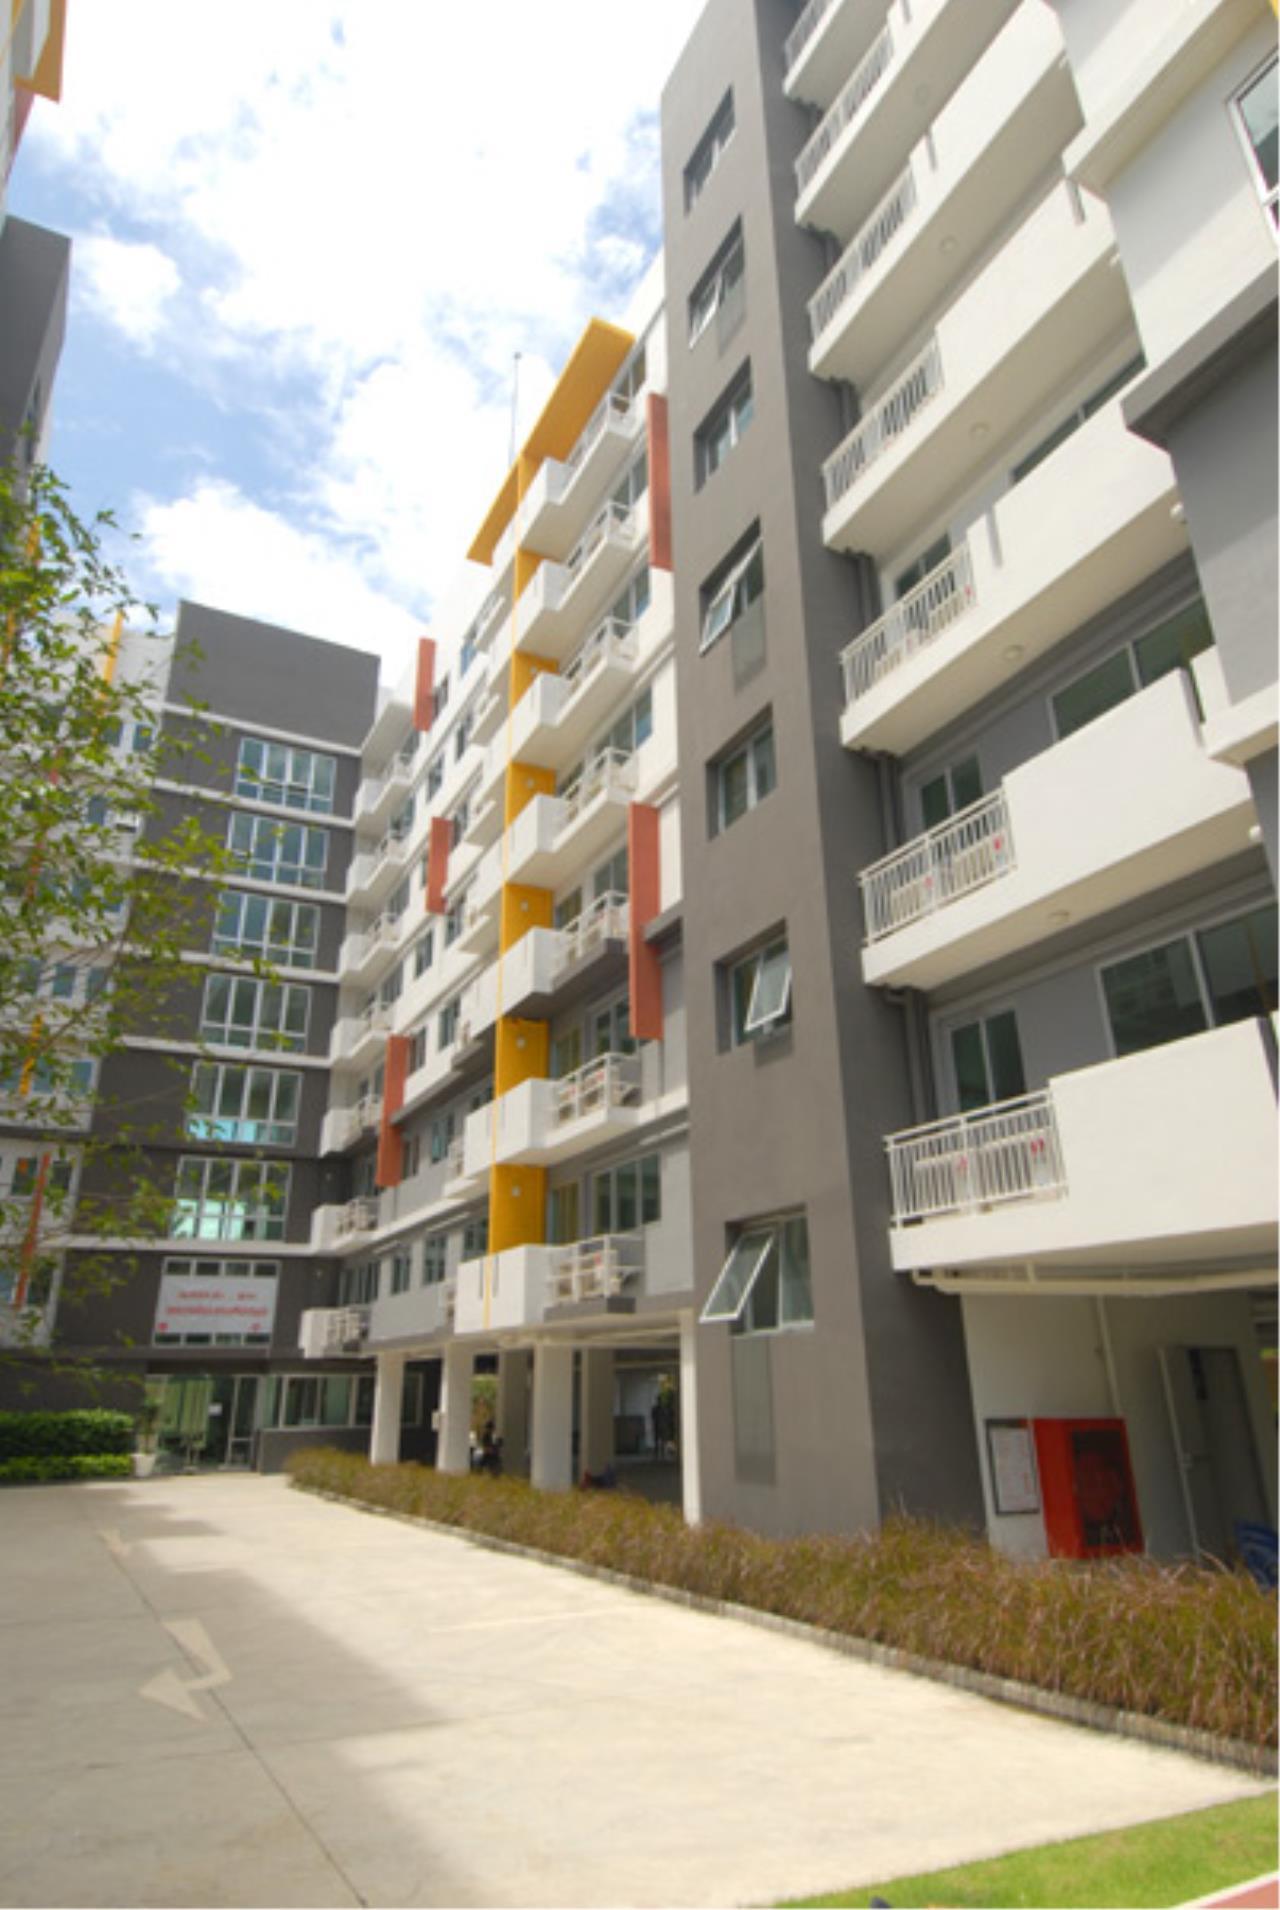 Quality Life Property Agency's S A L E! My Condo Sukhumvit 52 | 1 BED 1 BATH | 35.4 SQ. M. 7